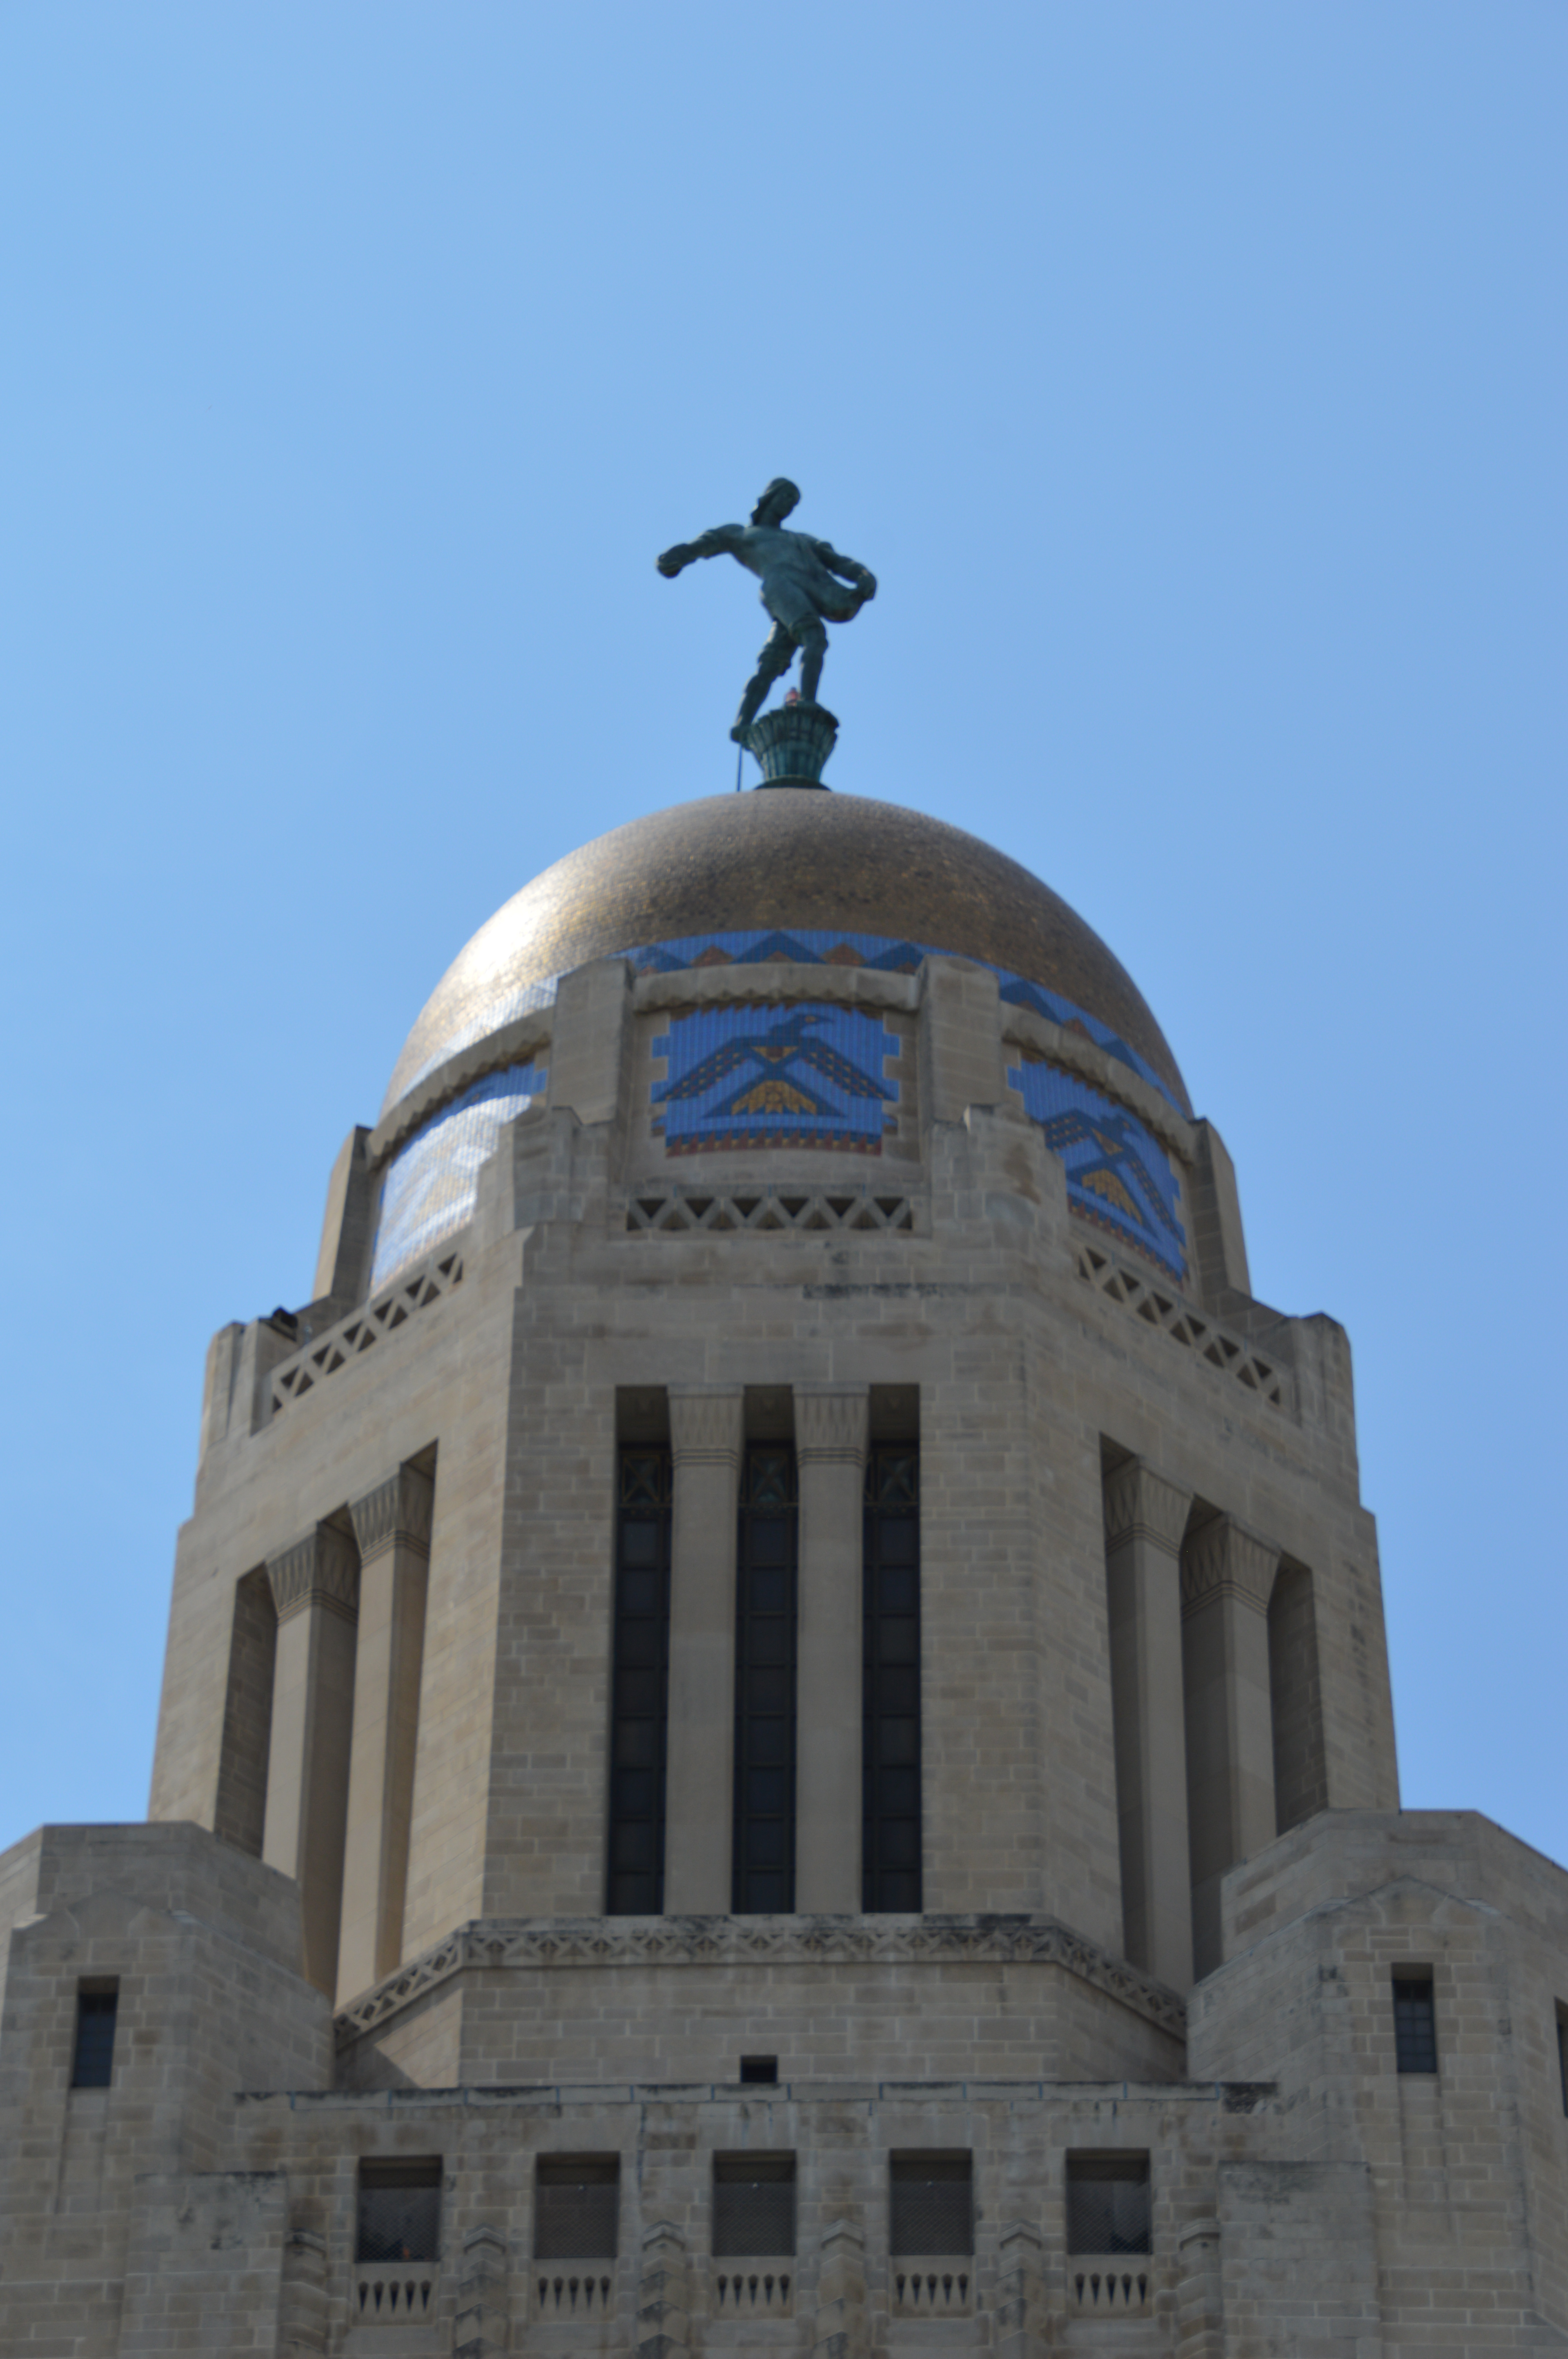 DSC_0057 Nebraska capitol dome - outside